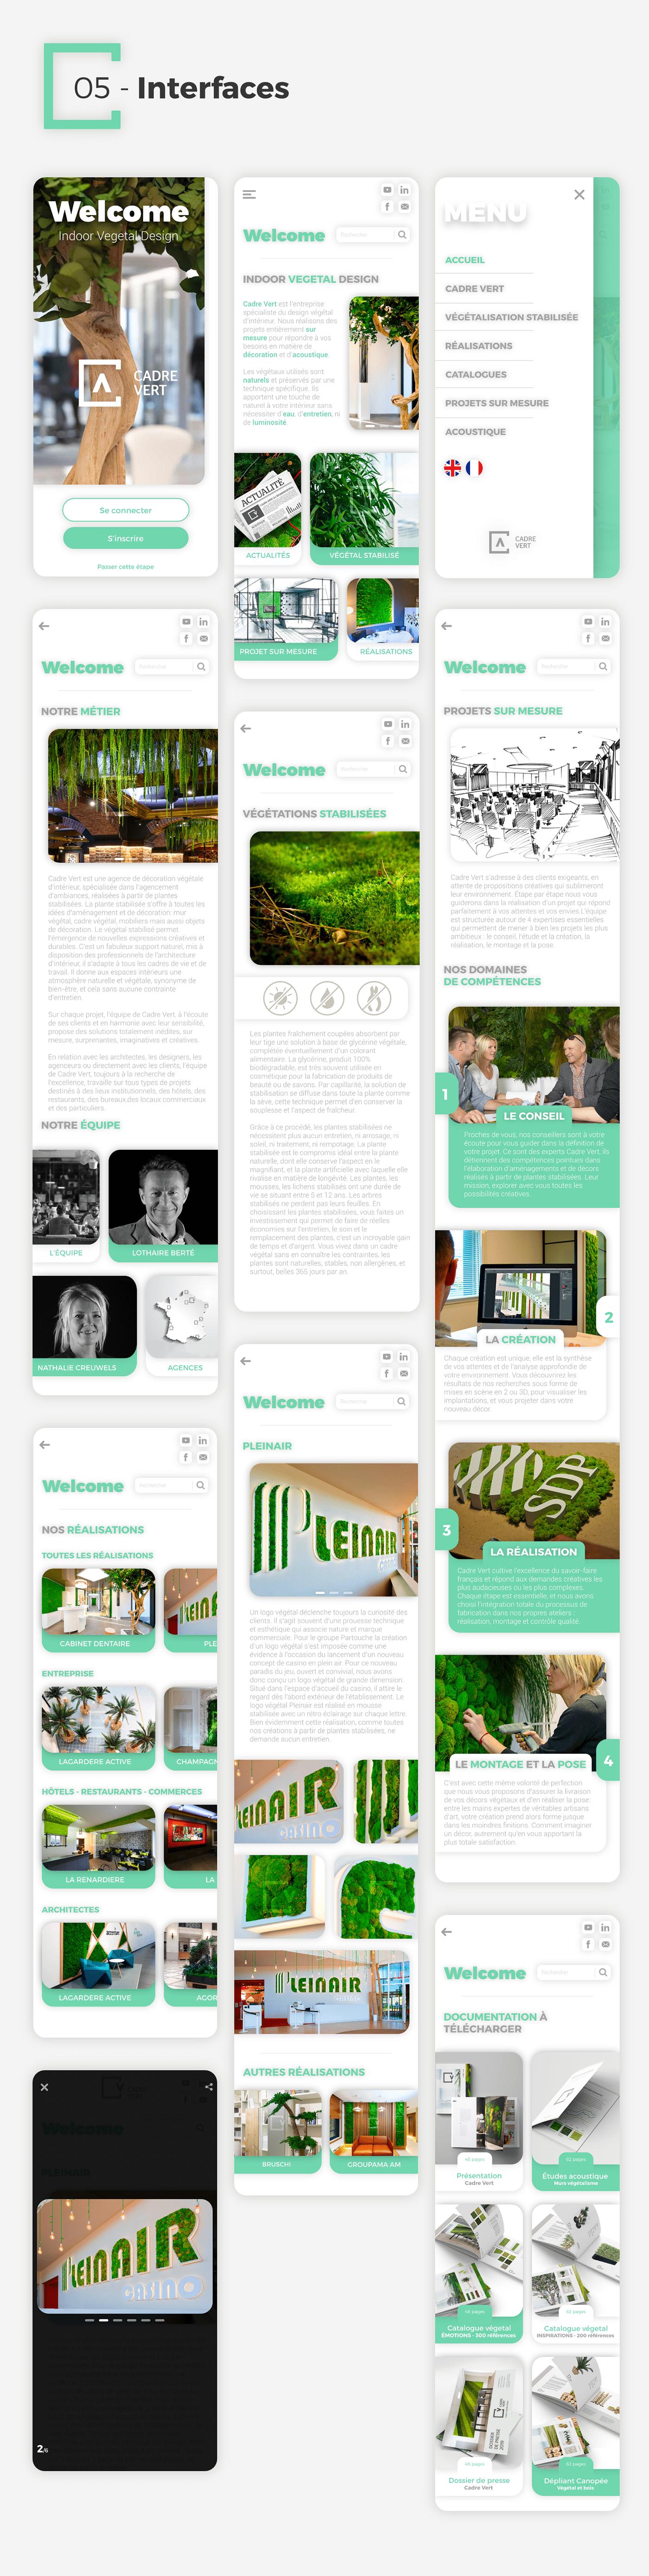 application Cadre Vert design Interface Plant plante UI/UX Design Web wireframe